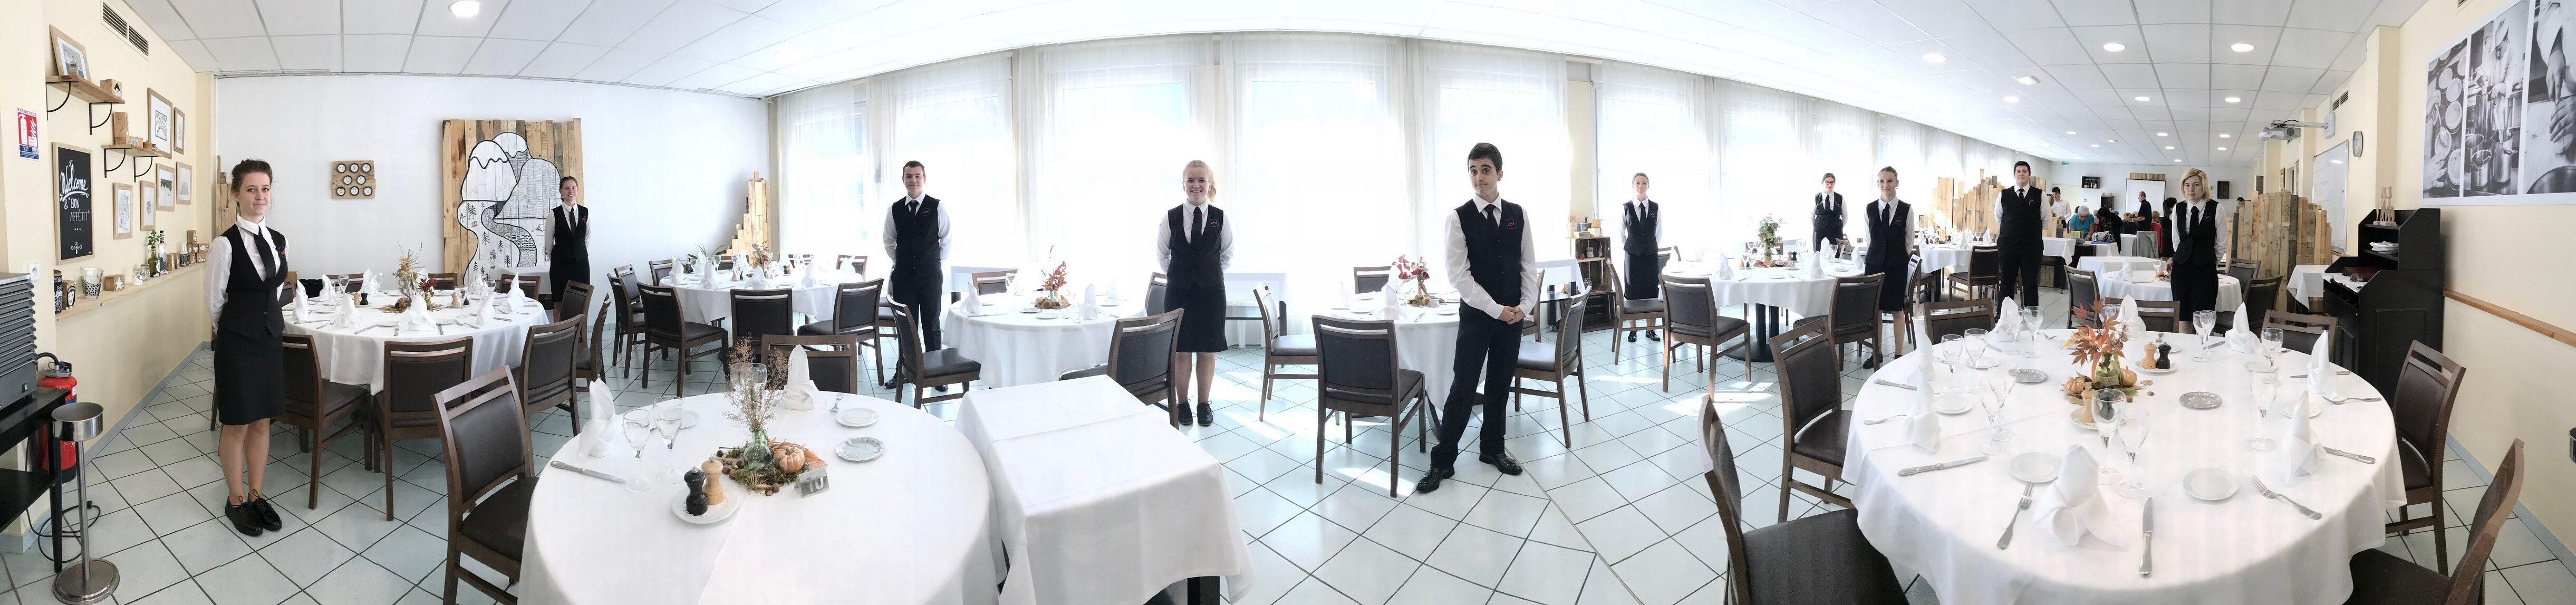 Restaurant pédagogique.jpg